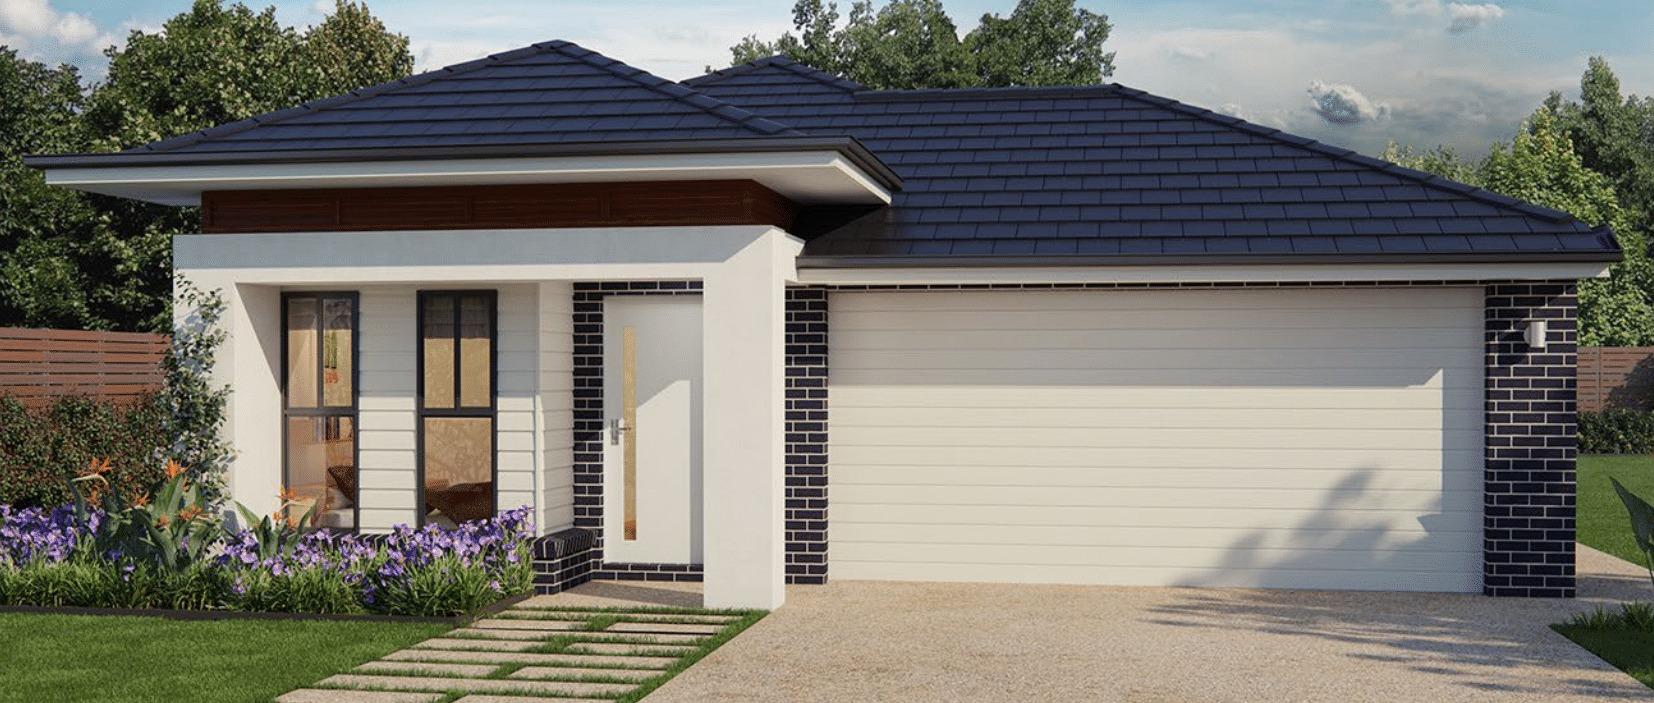 Lot 354 Mossman Place Pebble Creek, South Maclean QLD 4280